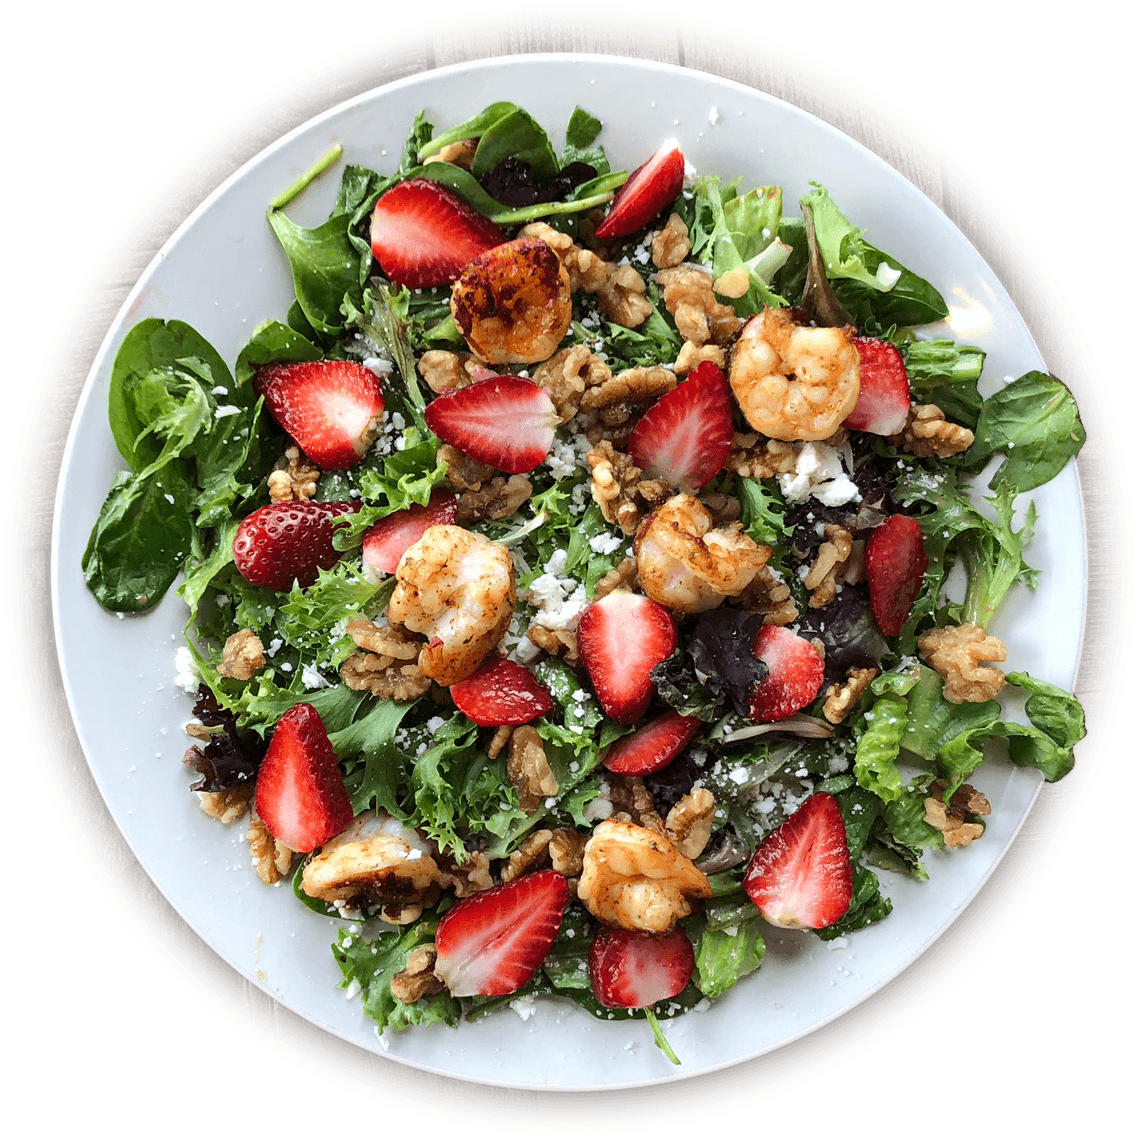 La Carreta's strawberry salad with shrimp on a plate.